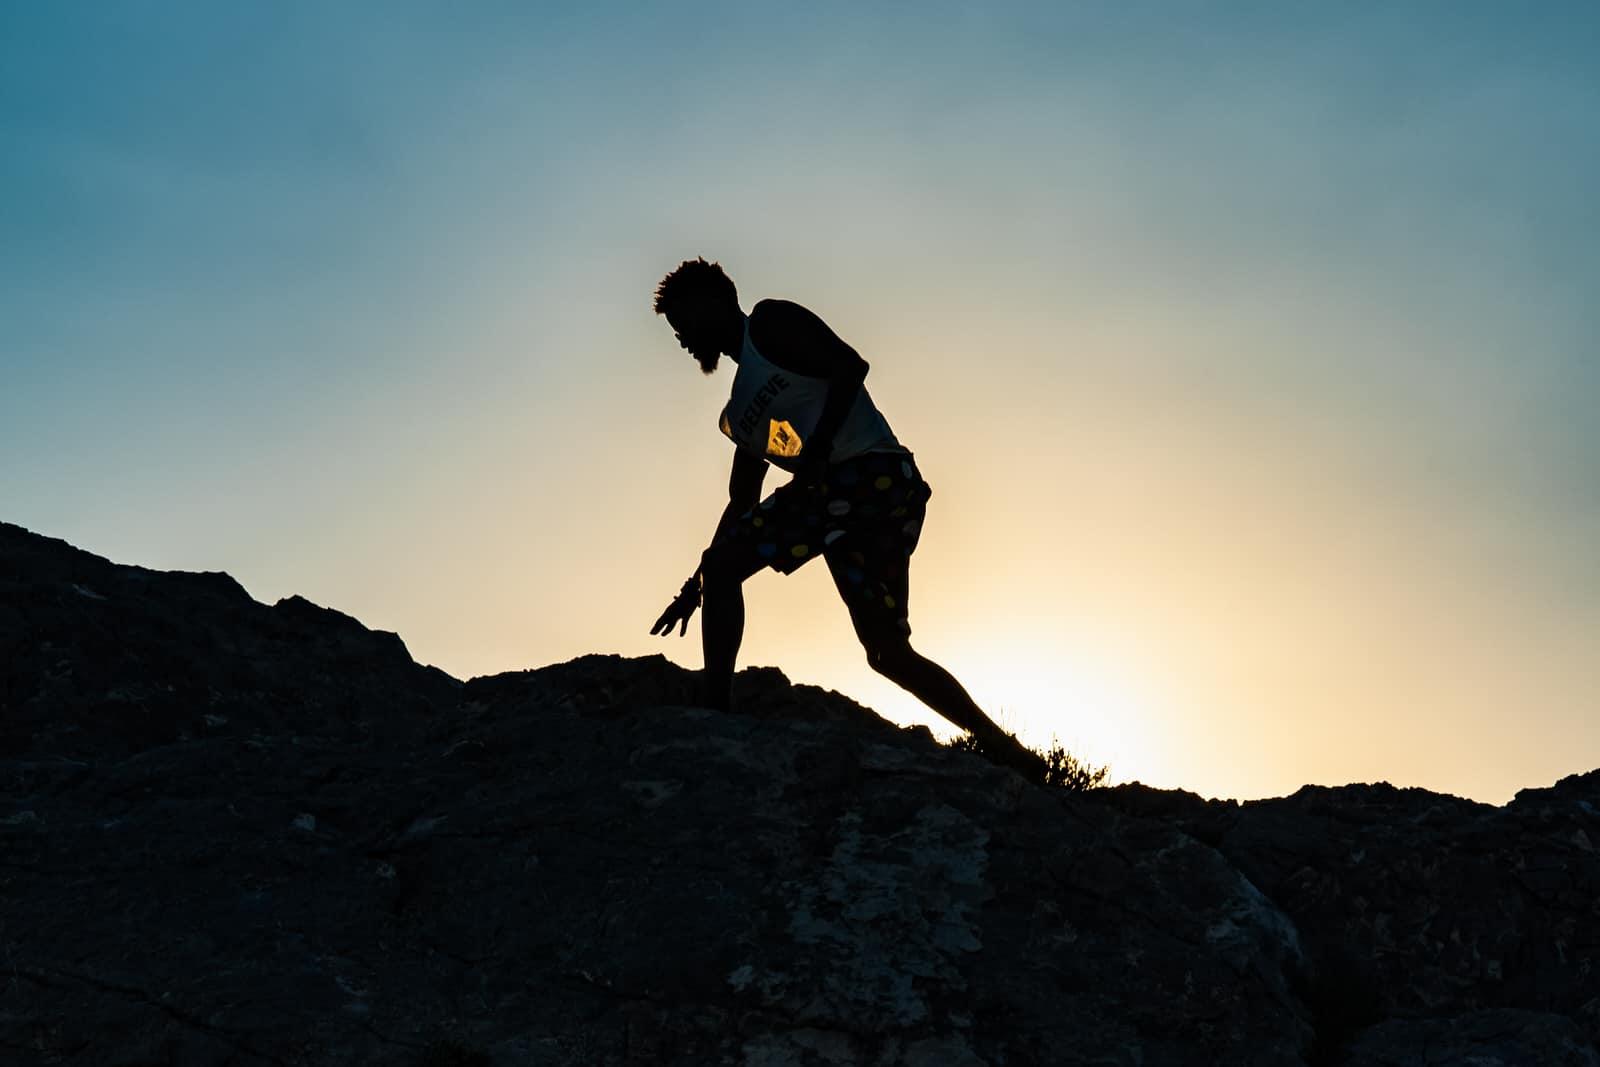 man climbs mountain in silhouette